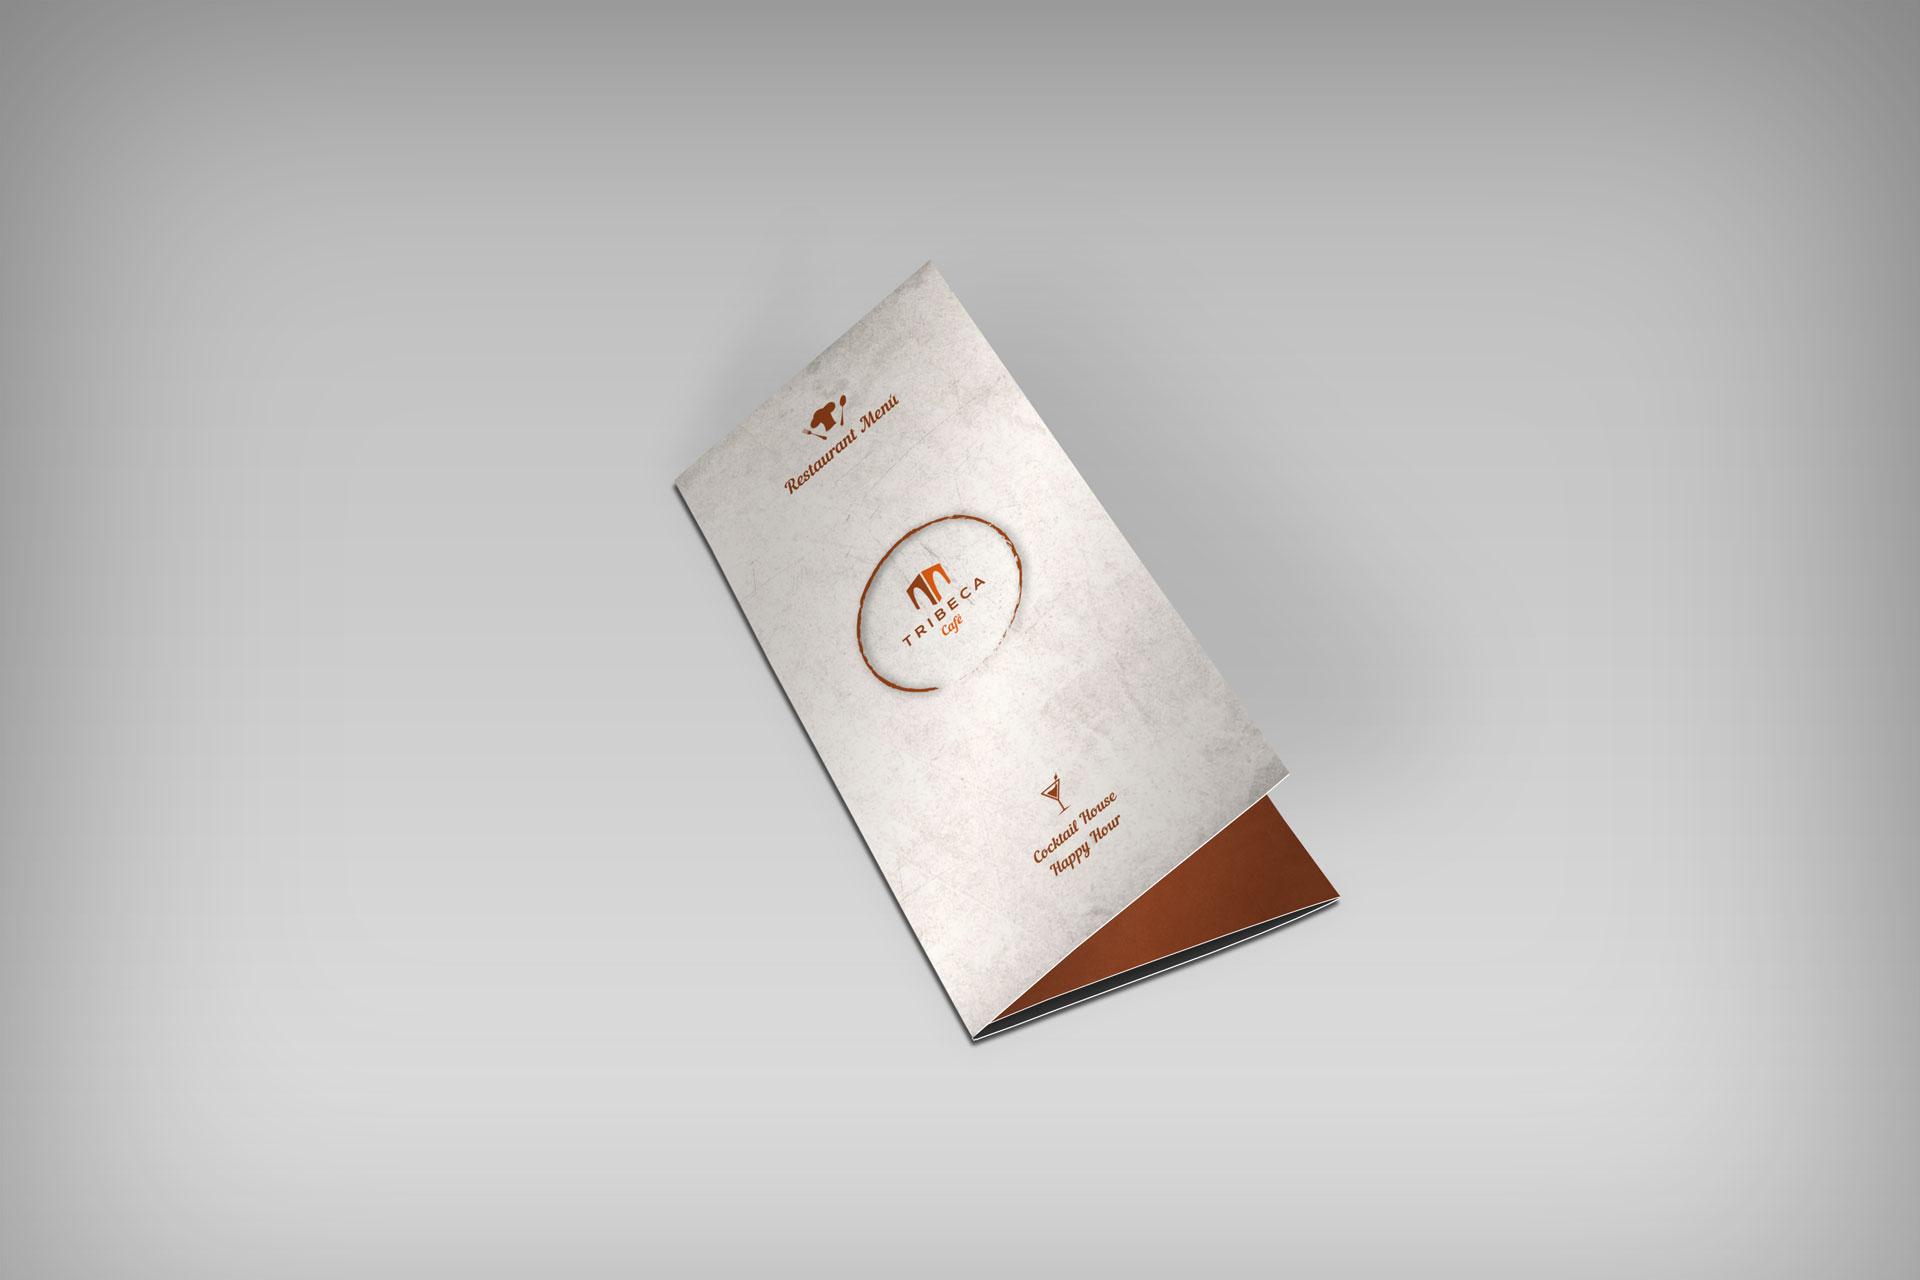 menu-ristorante-logo-ristorante